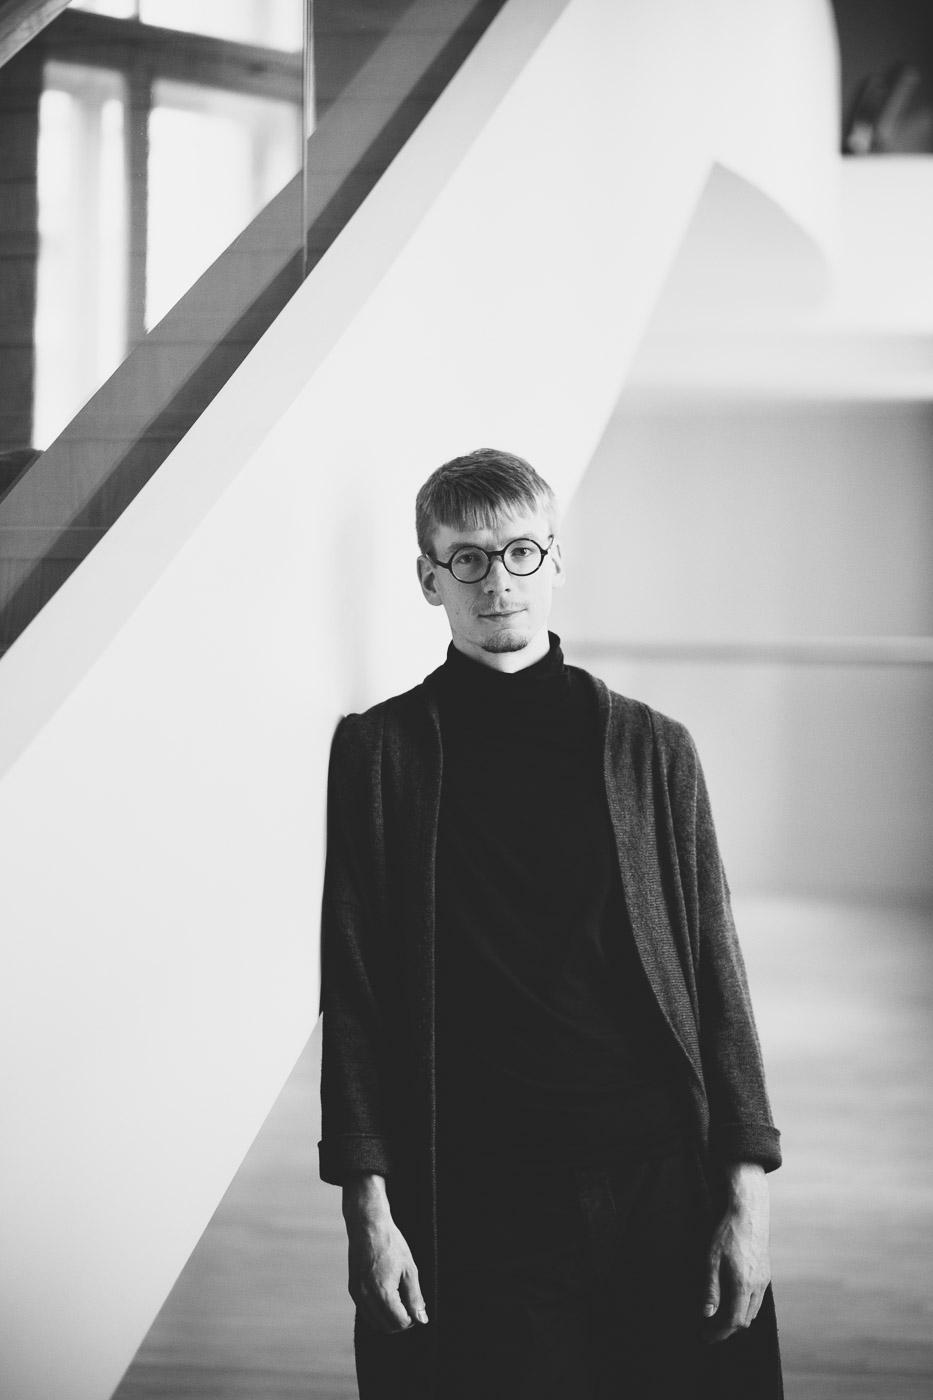 Krists-Auznieks--foto-Girts-Ragelis